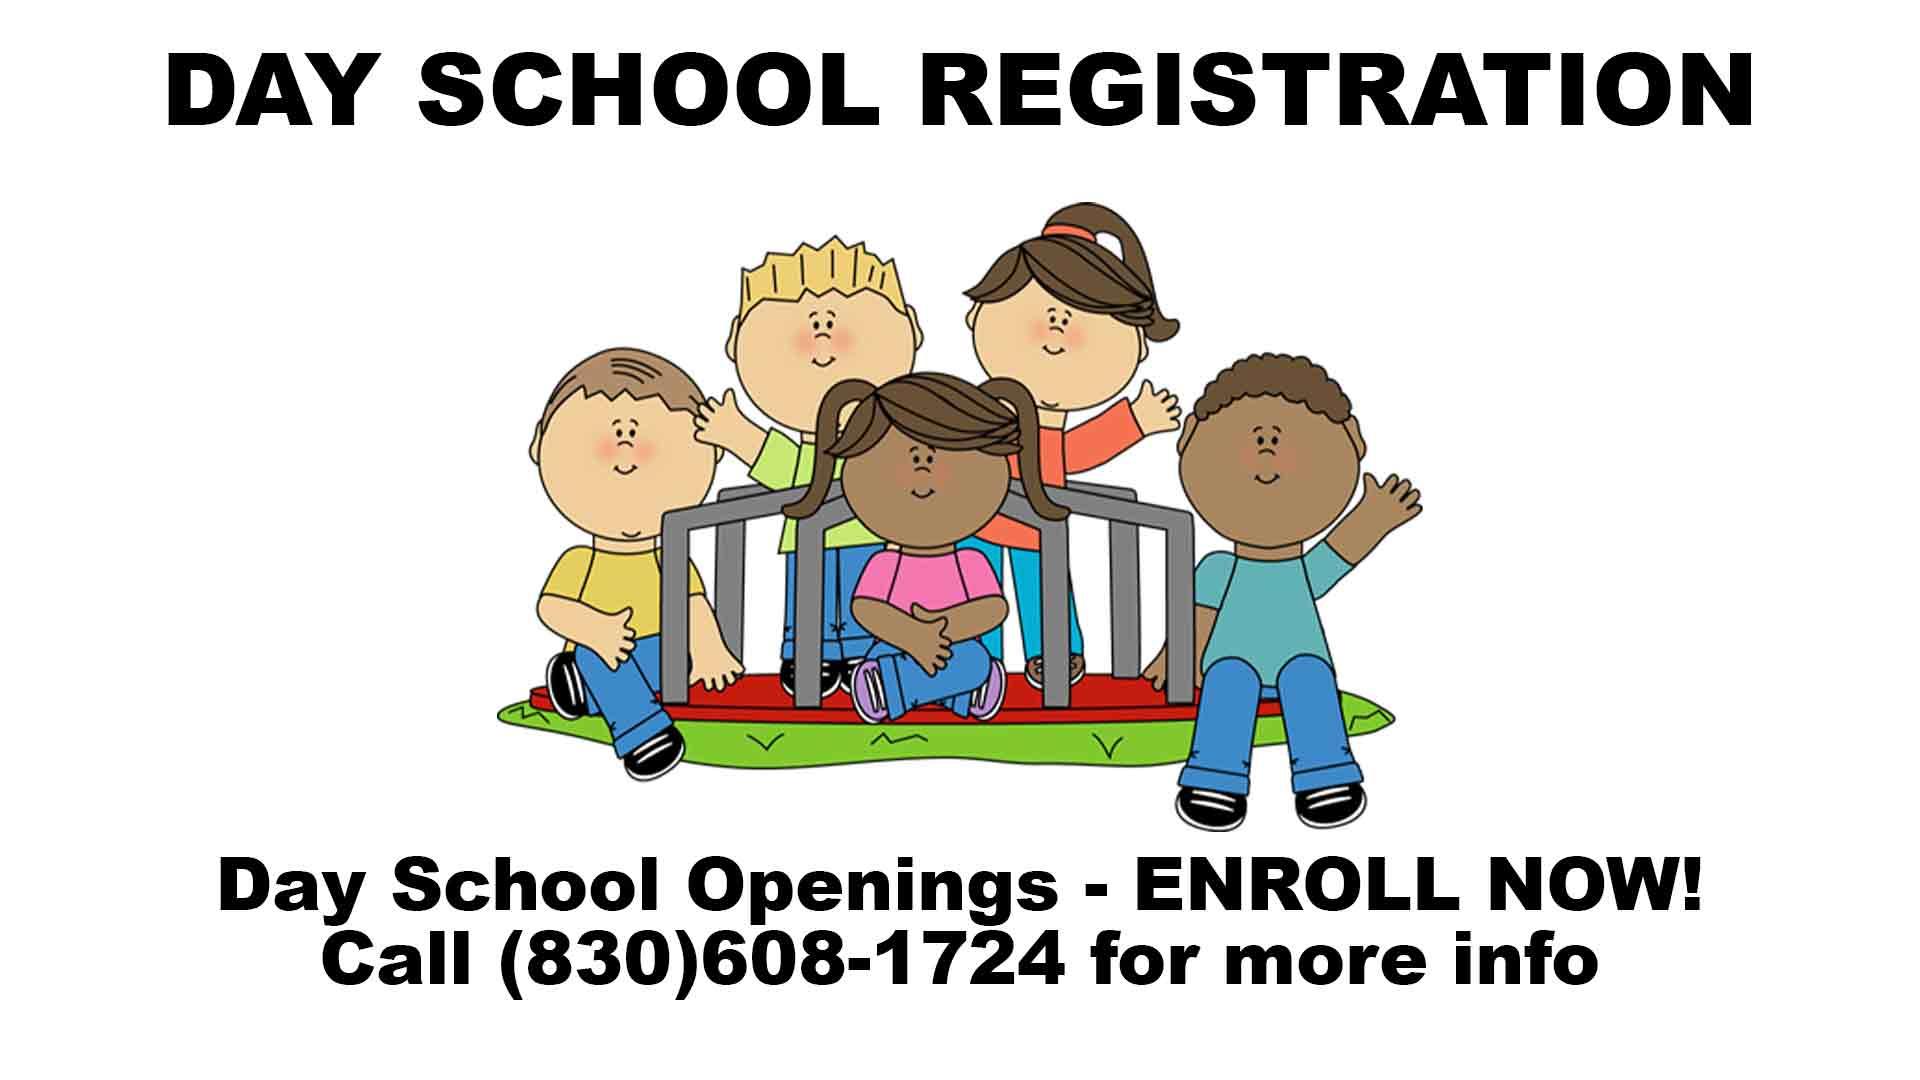 Day School Openings - Enroll Now!